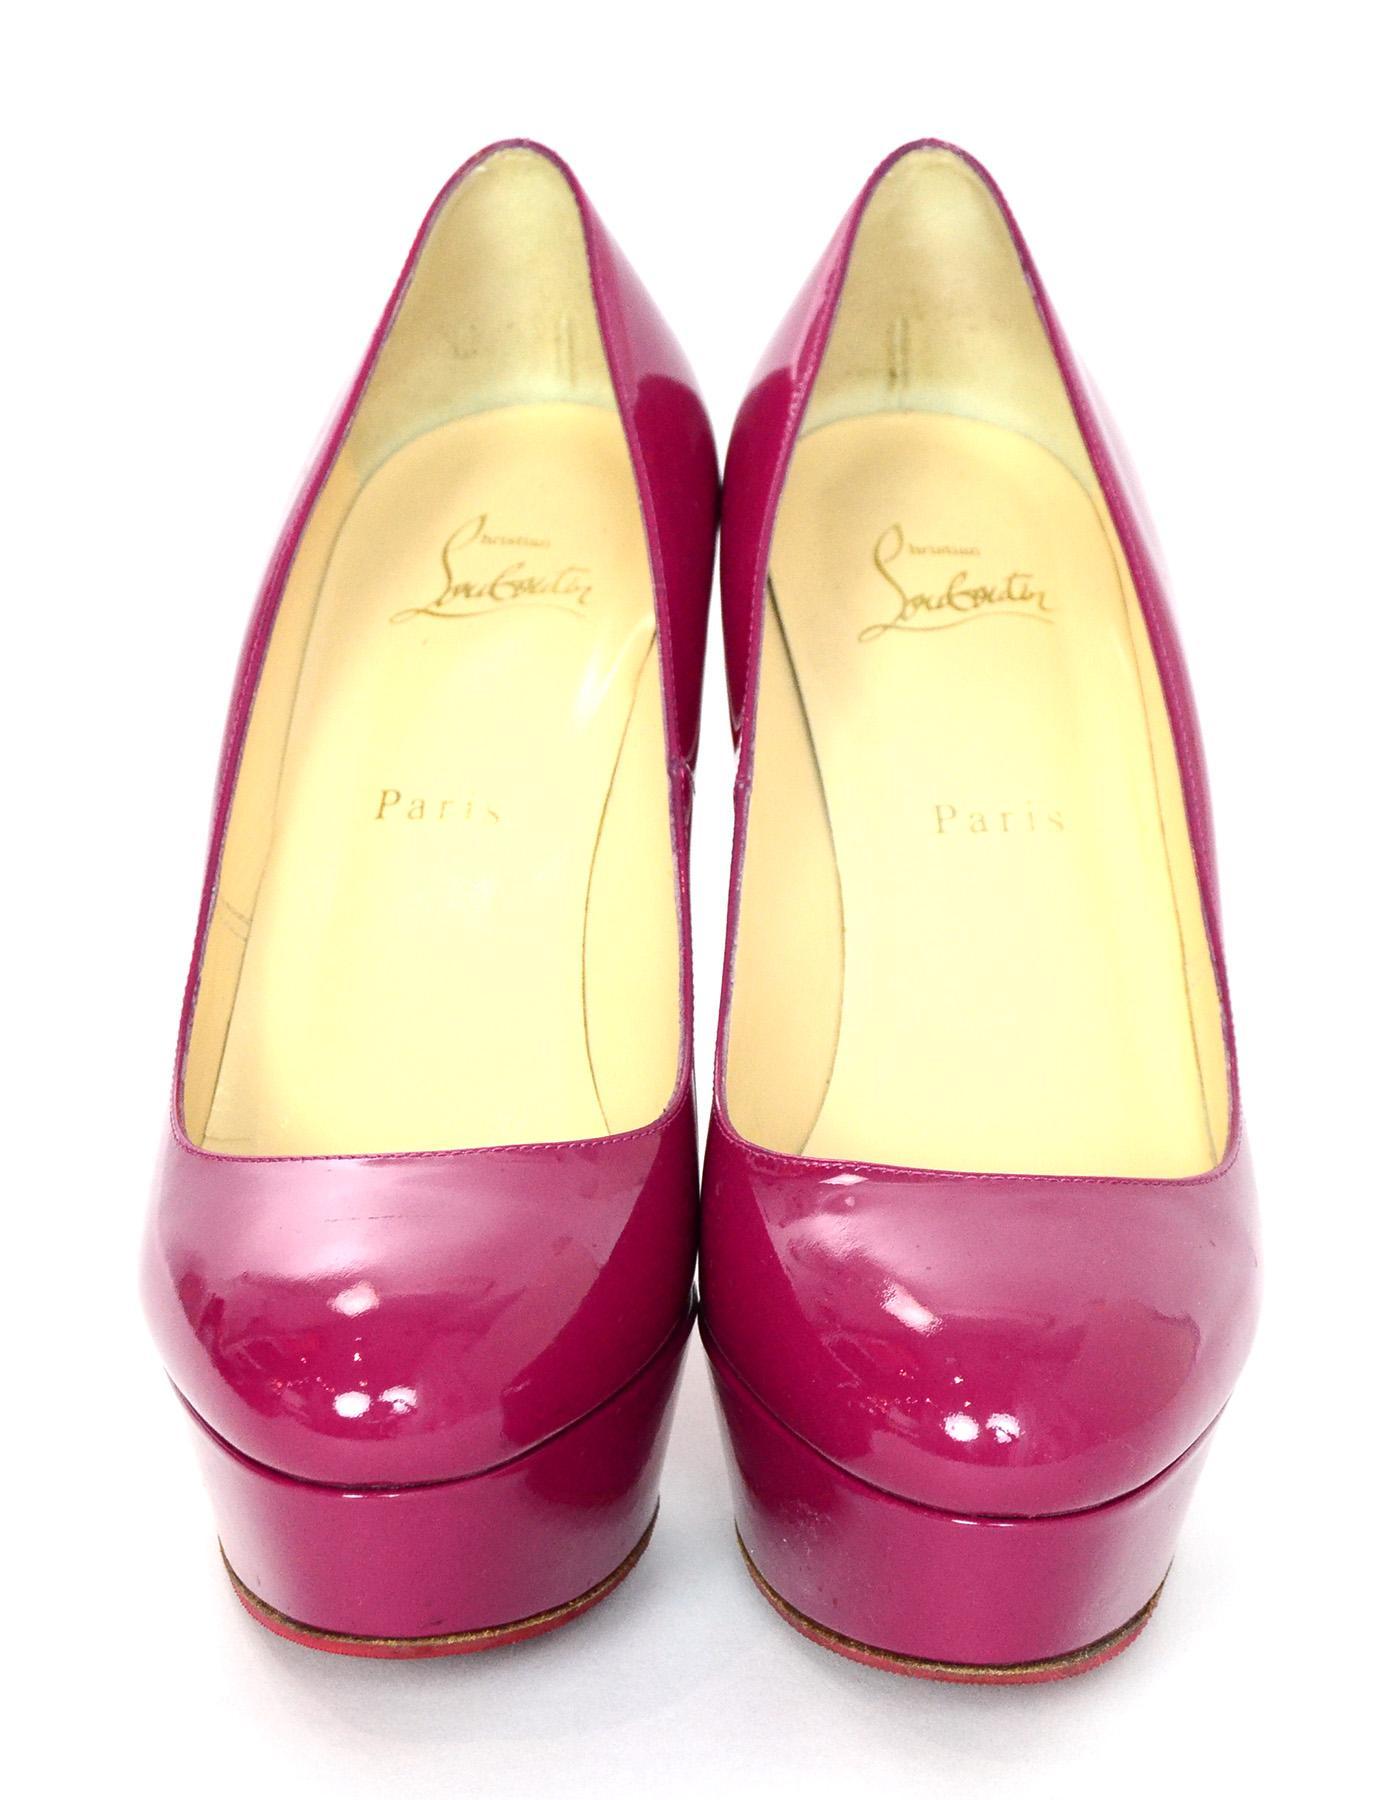 8ac3078b13ba Christian Louboutin Pink Patent Leather Bianca 120 Platform Pumps Sz 39 rt.   845 For Sale at 1stdibs